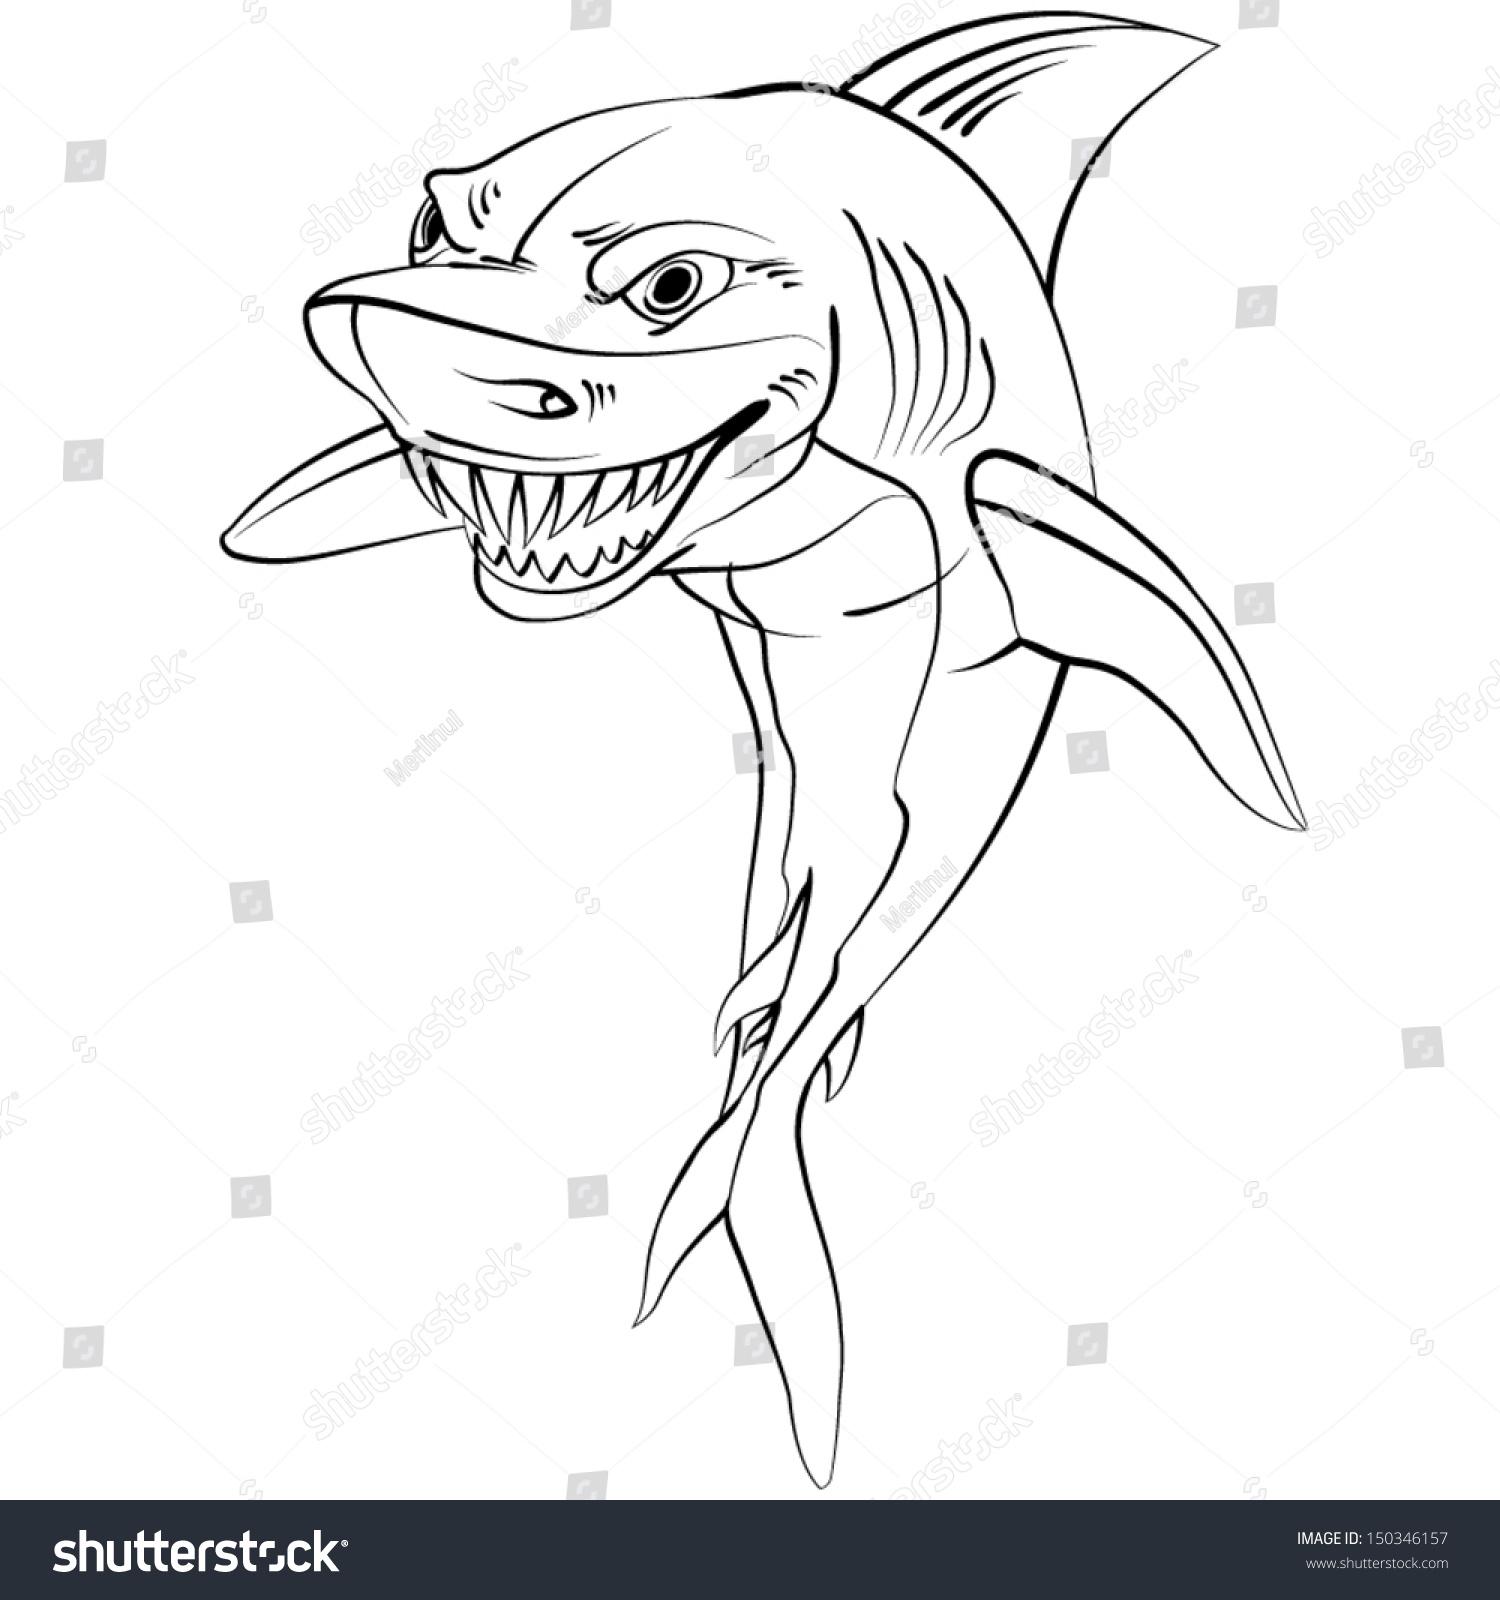 1500x1600 Cartoon Shark Drawing Cartoon Shark Drawing Style Black On Stock